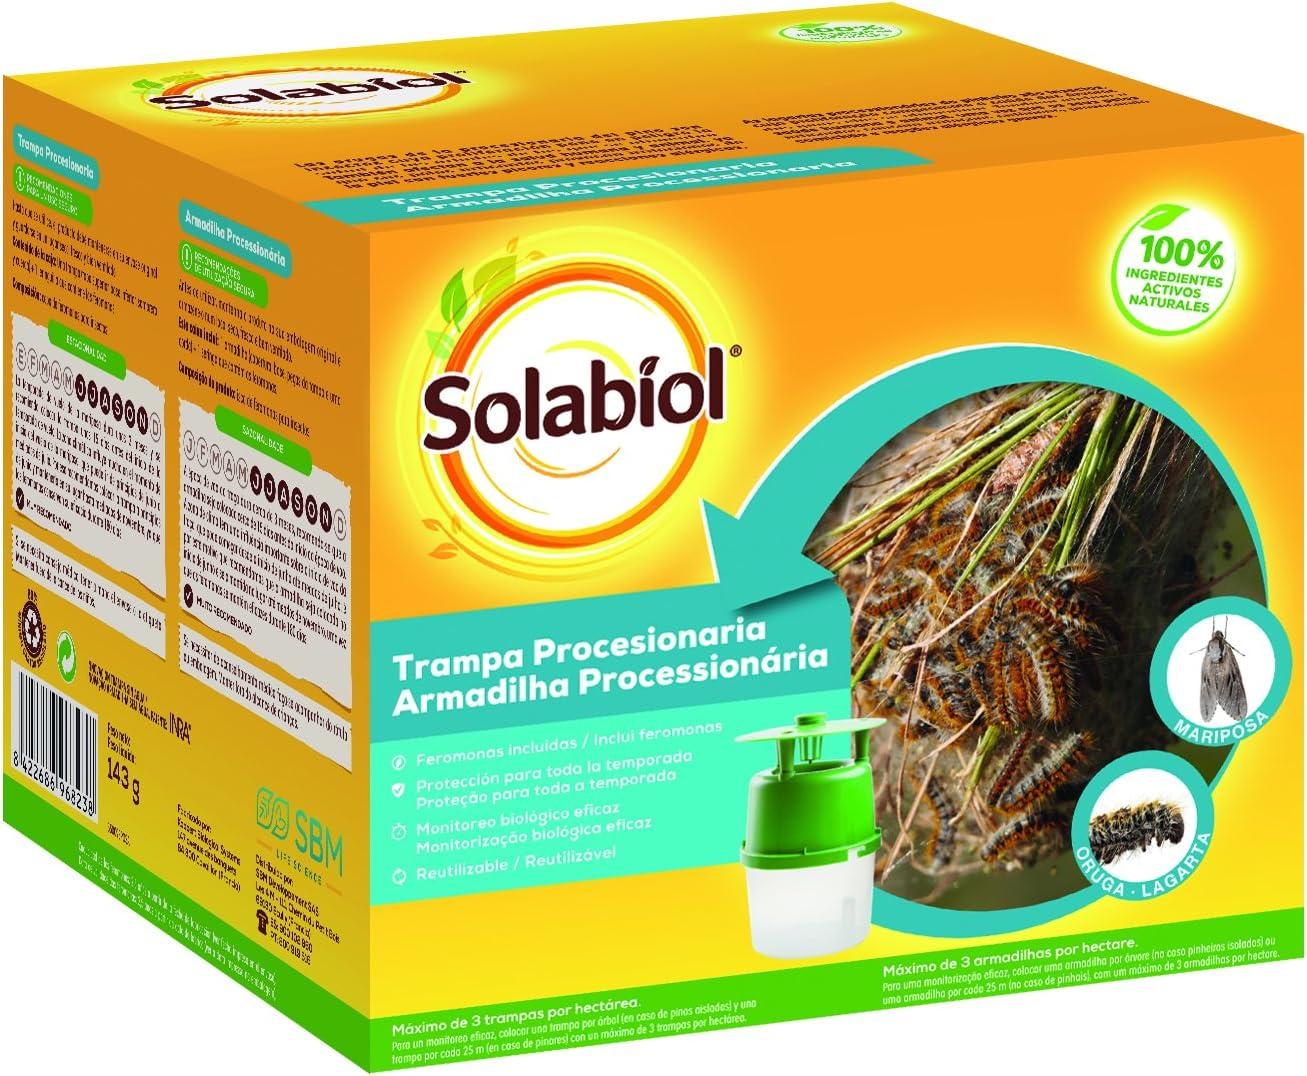 Solabiol Trampa Procesionaria, Verde Agua, 14 X 14 X 12 cm: Amazon ...